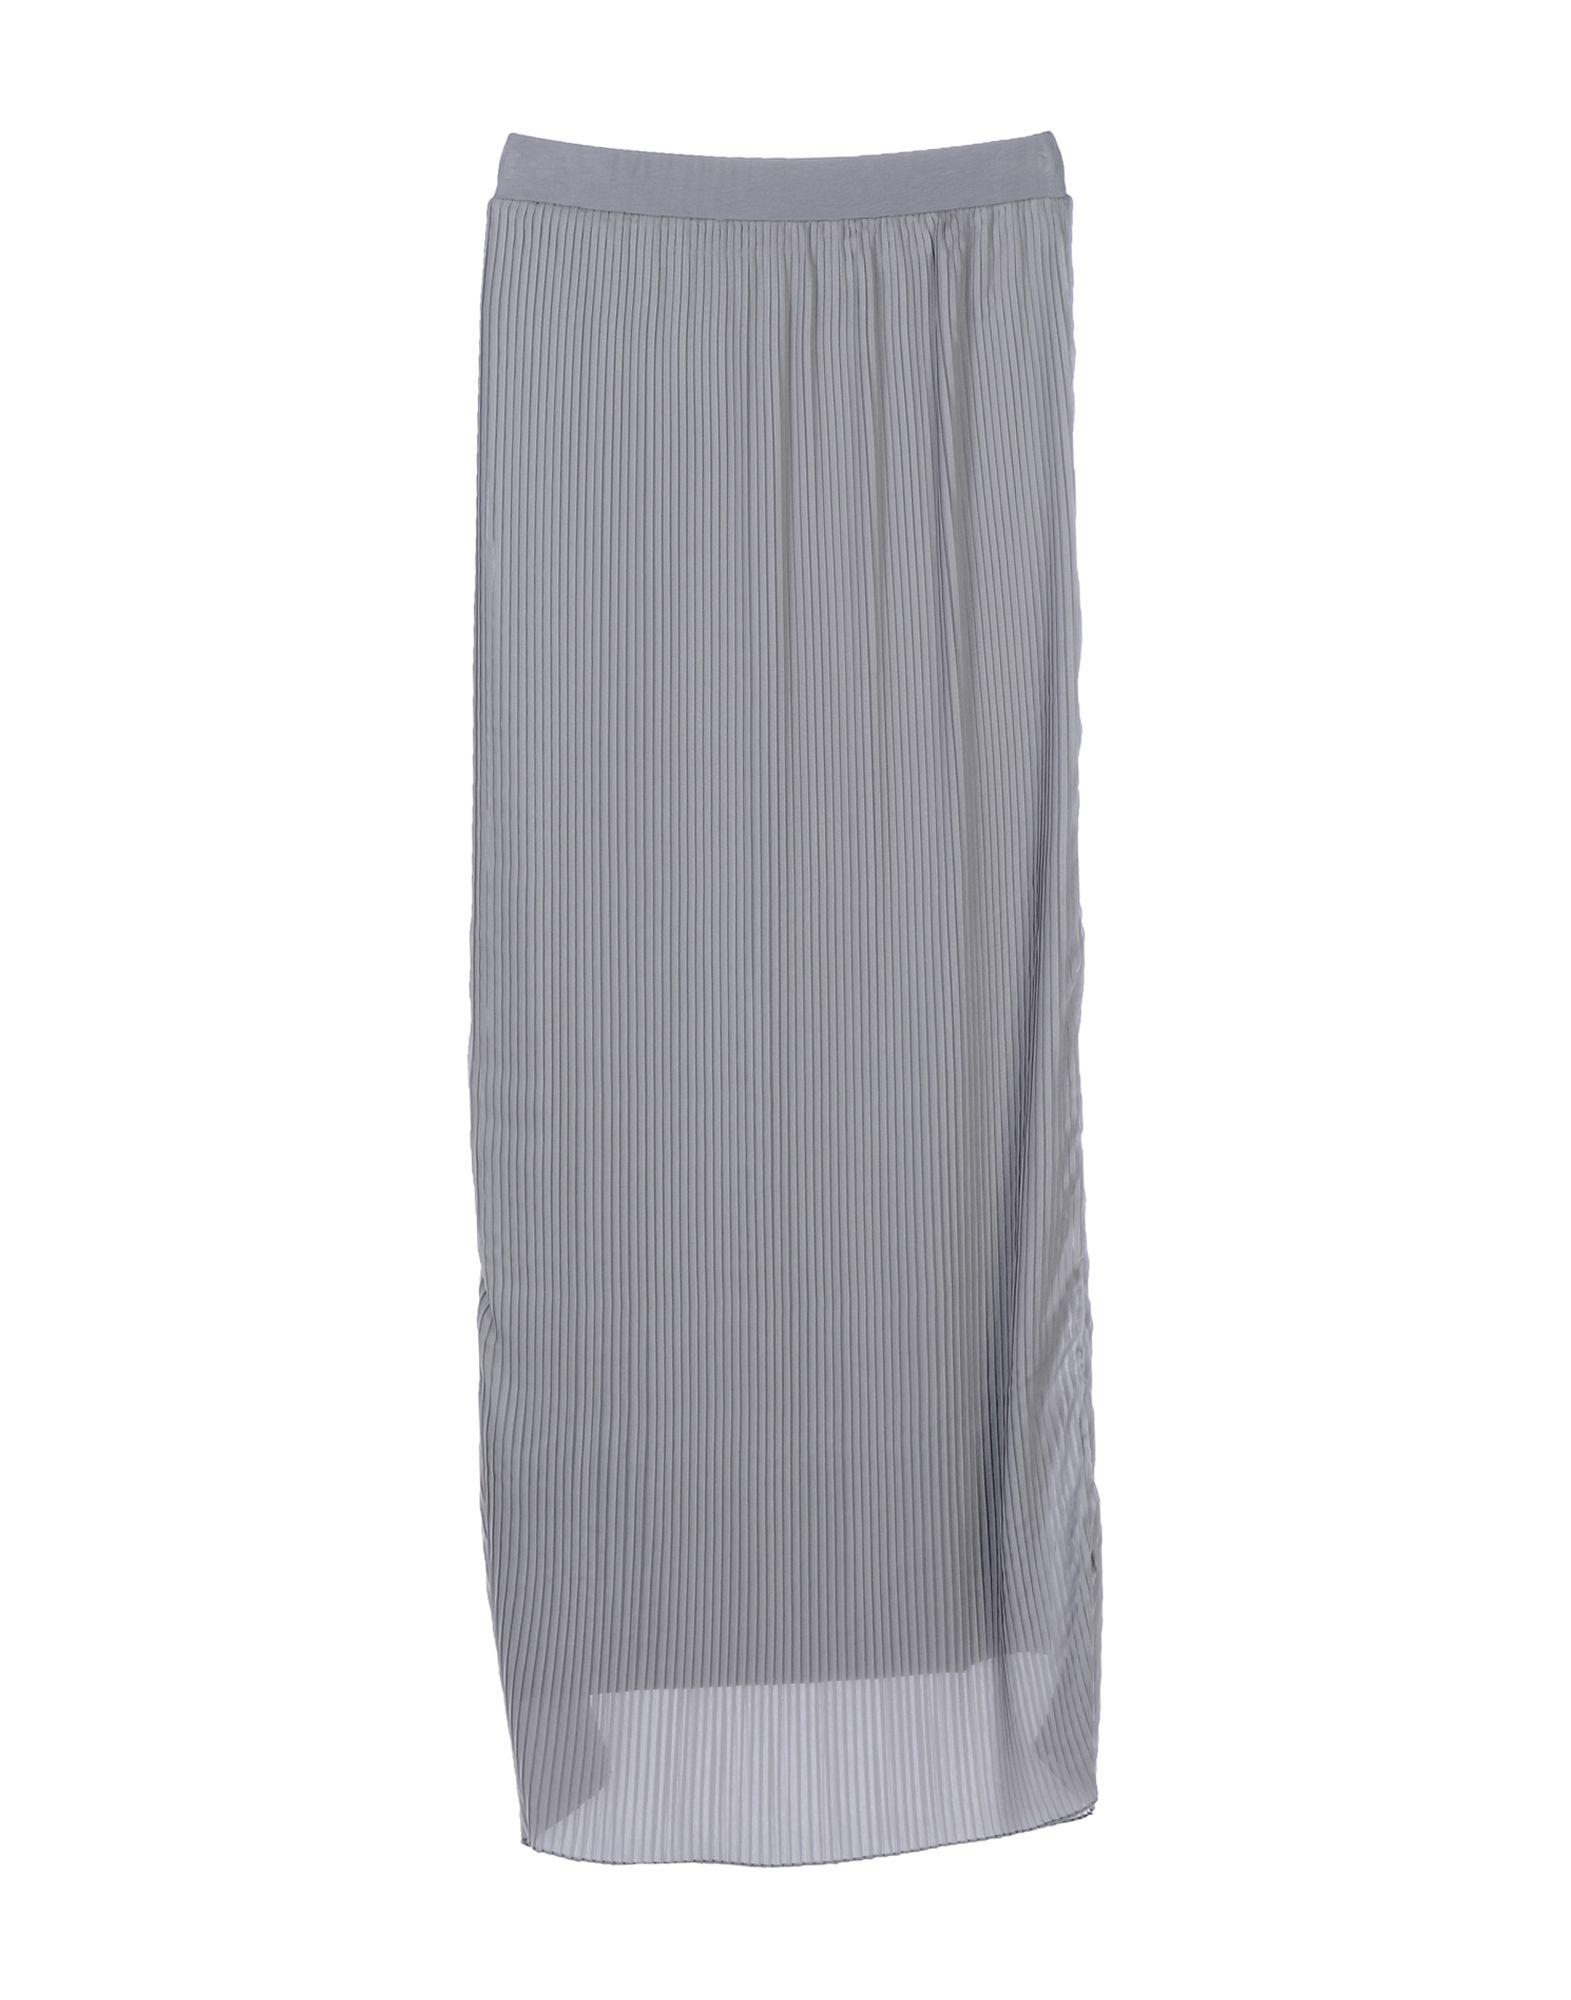 ALPHA MASSIMO REBECCHI Платье длиной 3/4 boomerang alpha line 3